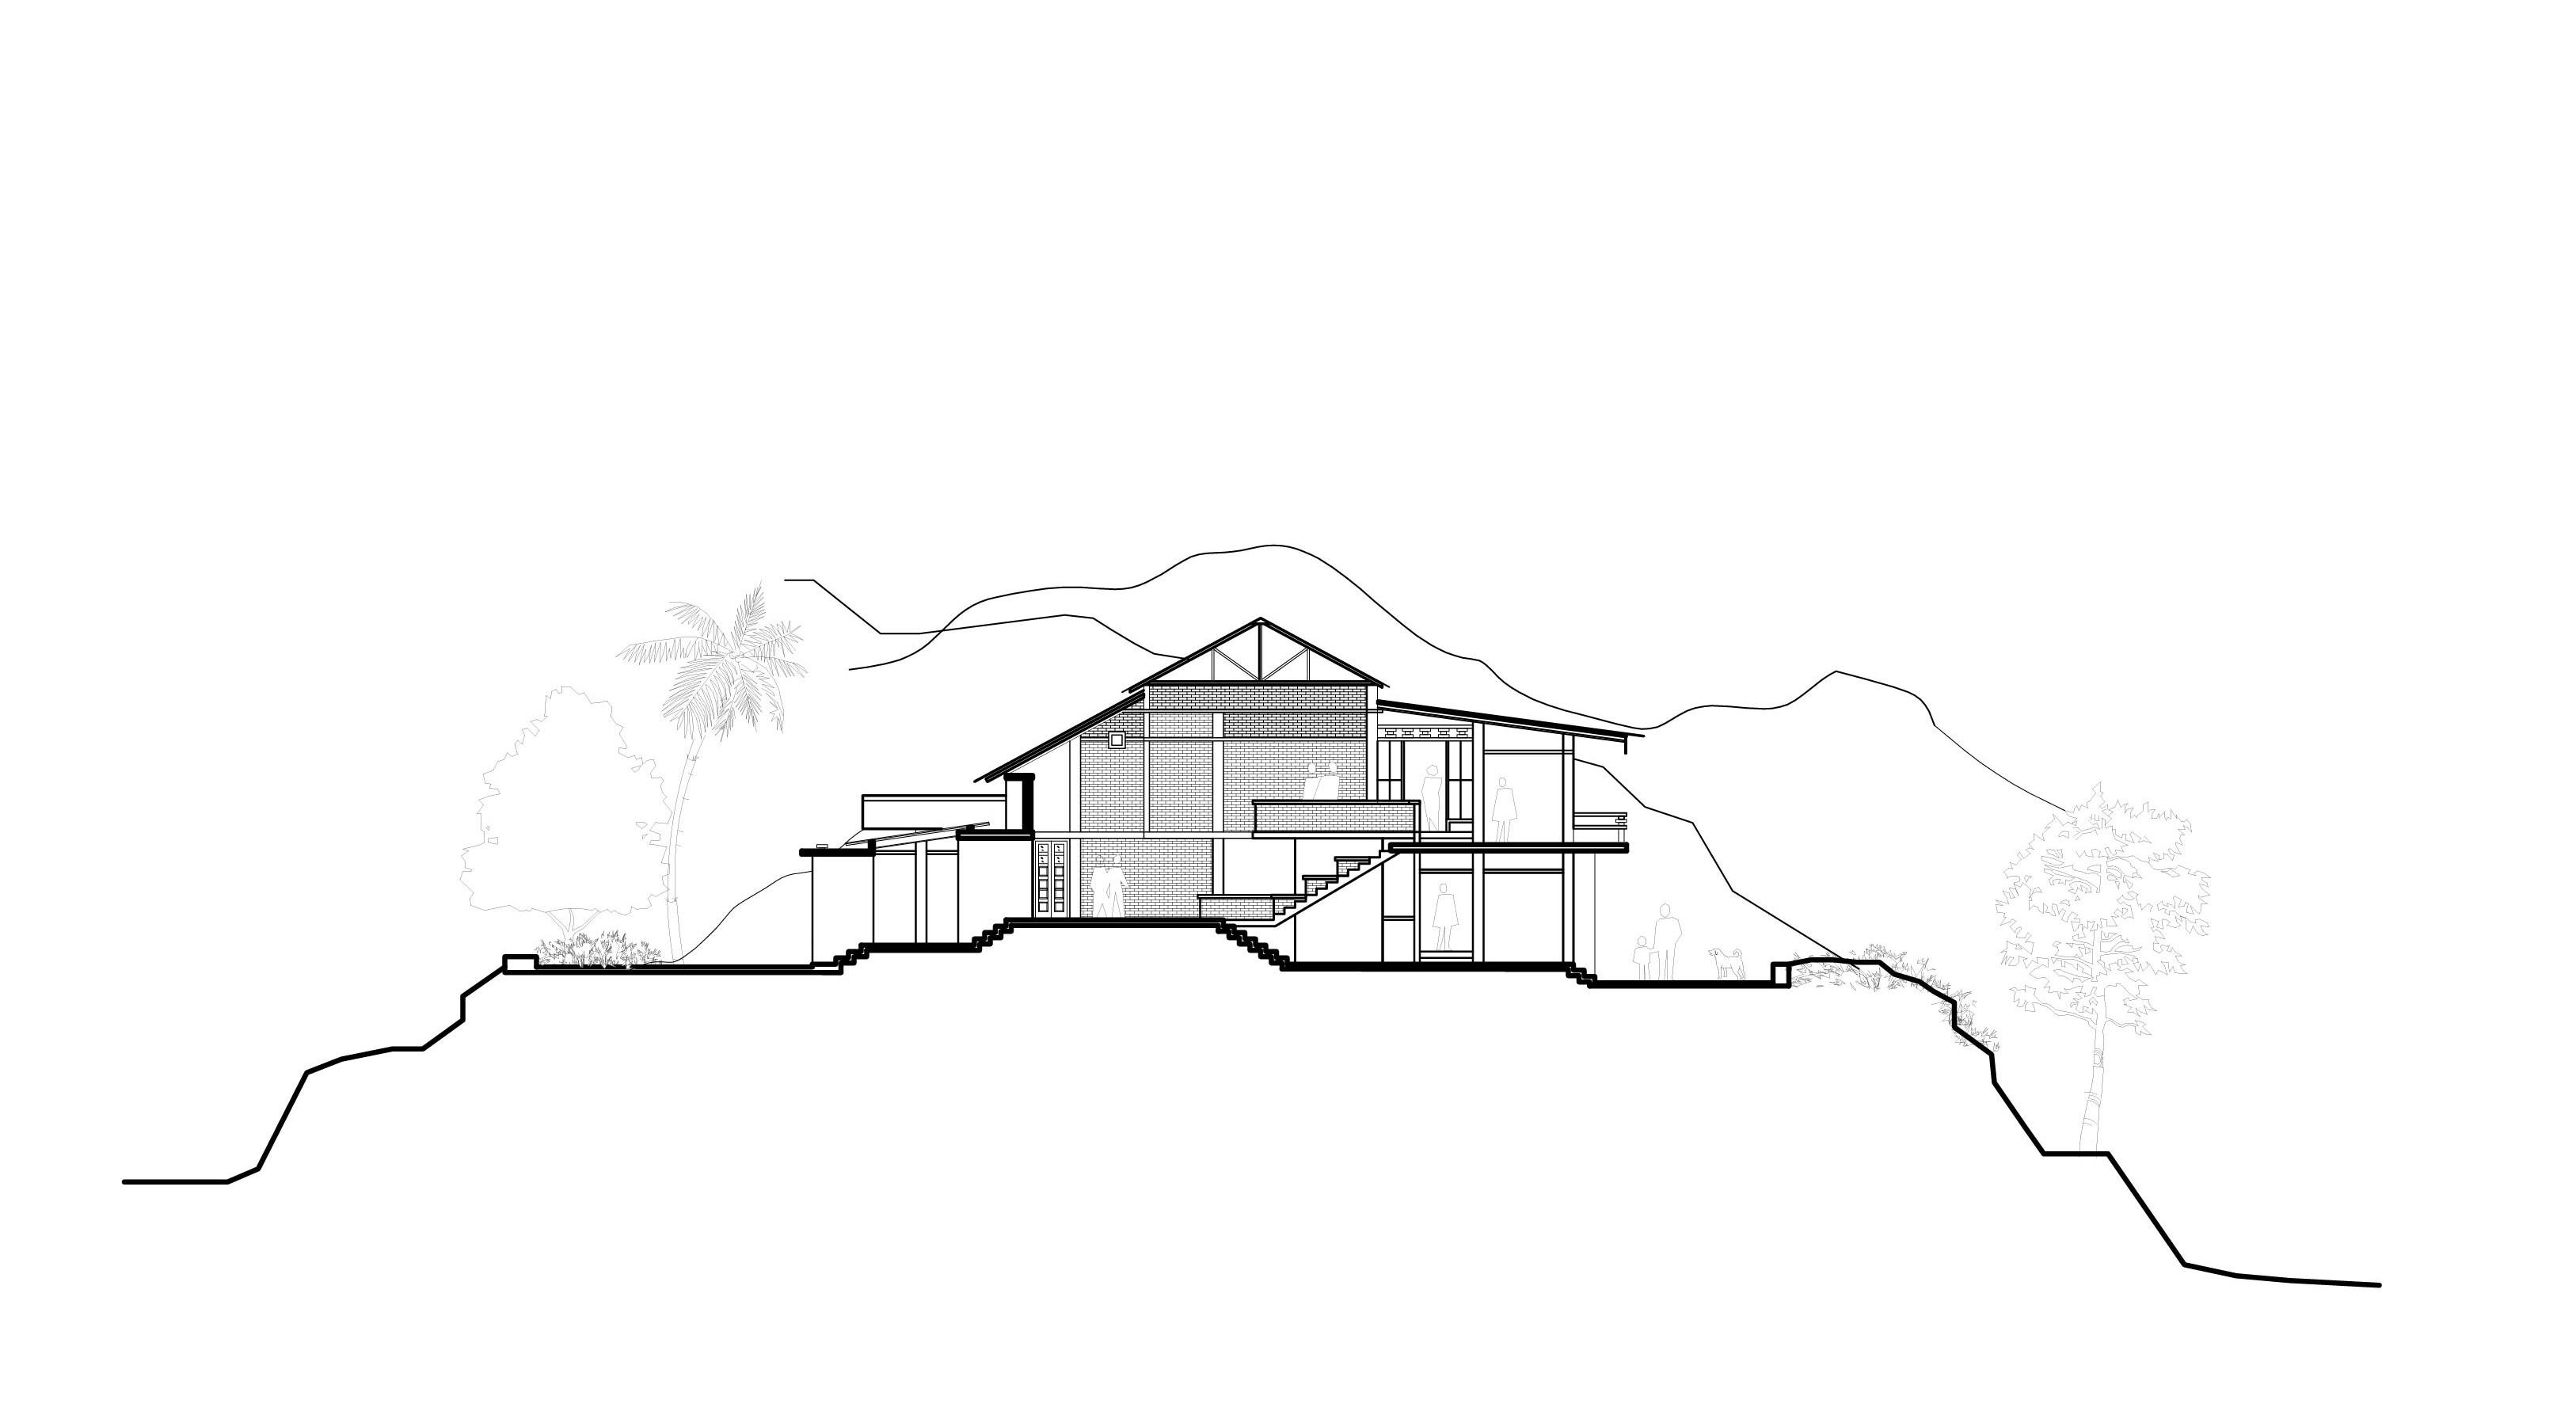 Suntop Roofing